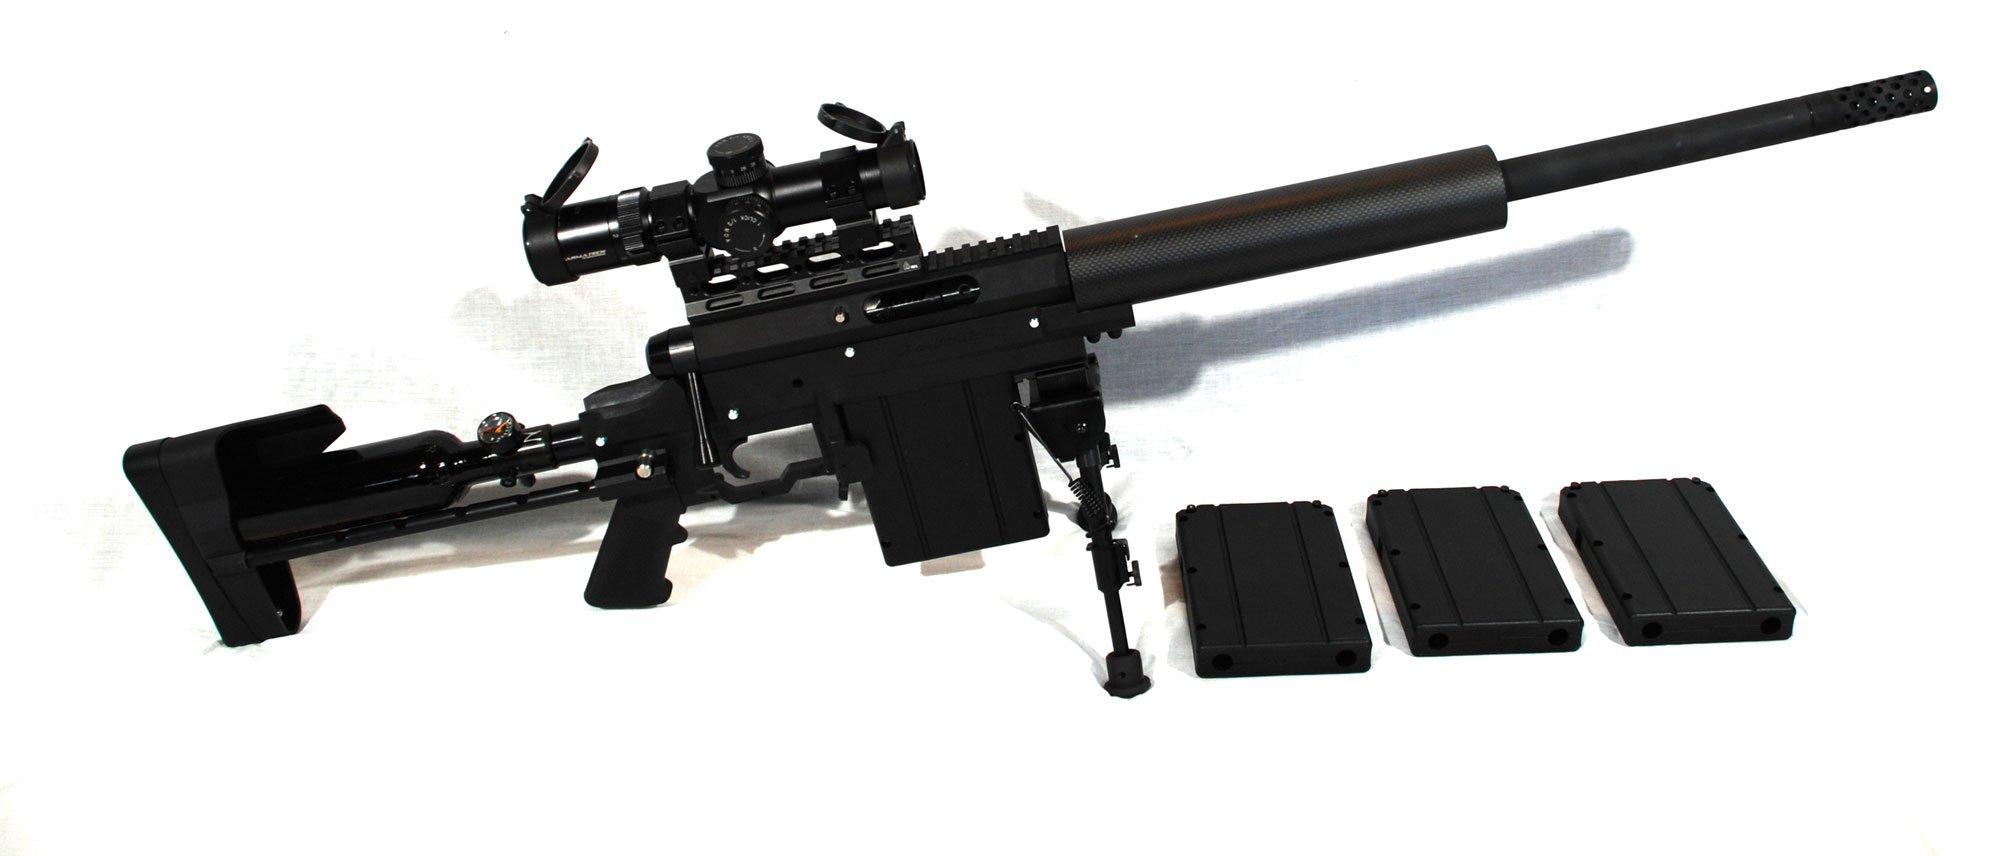 Carmatech SAR12C Paintball Gun Review